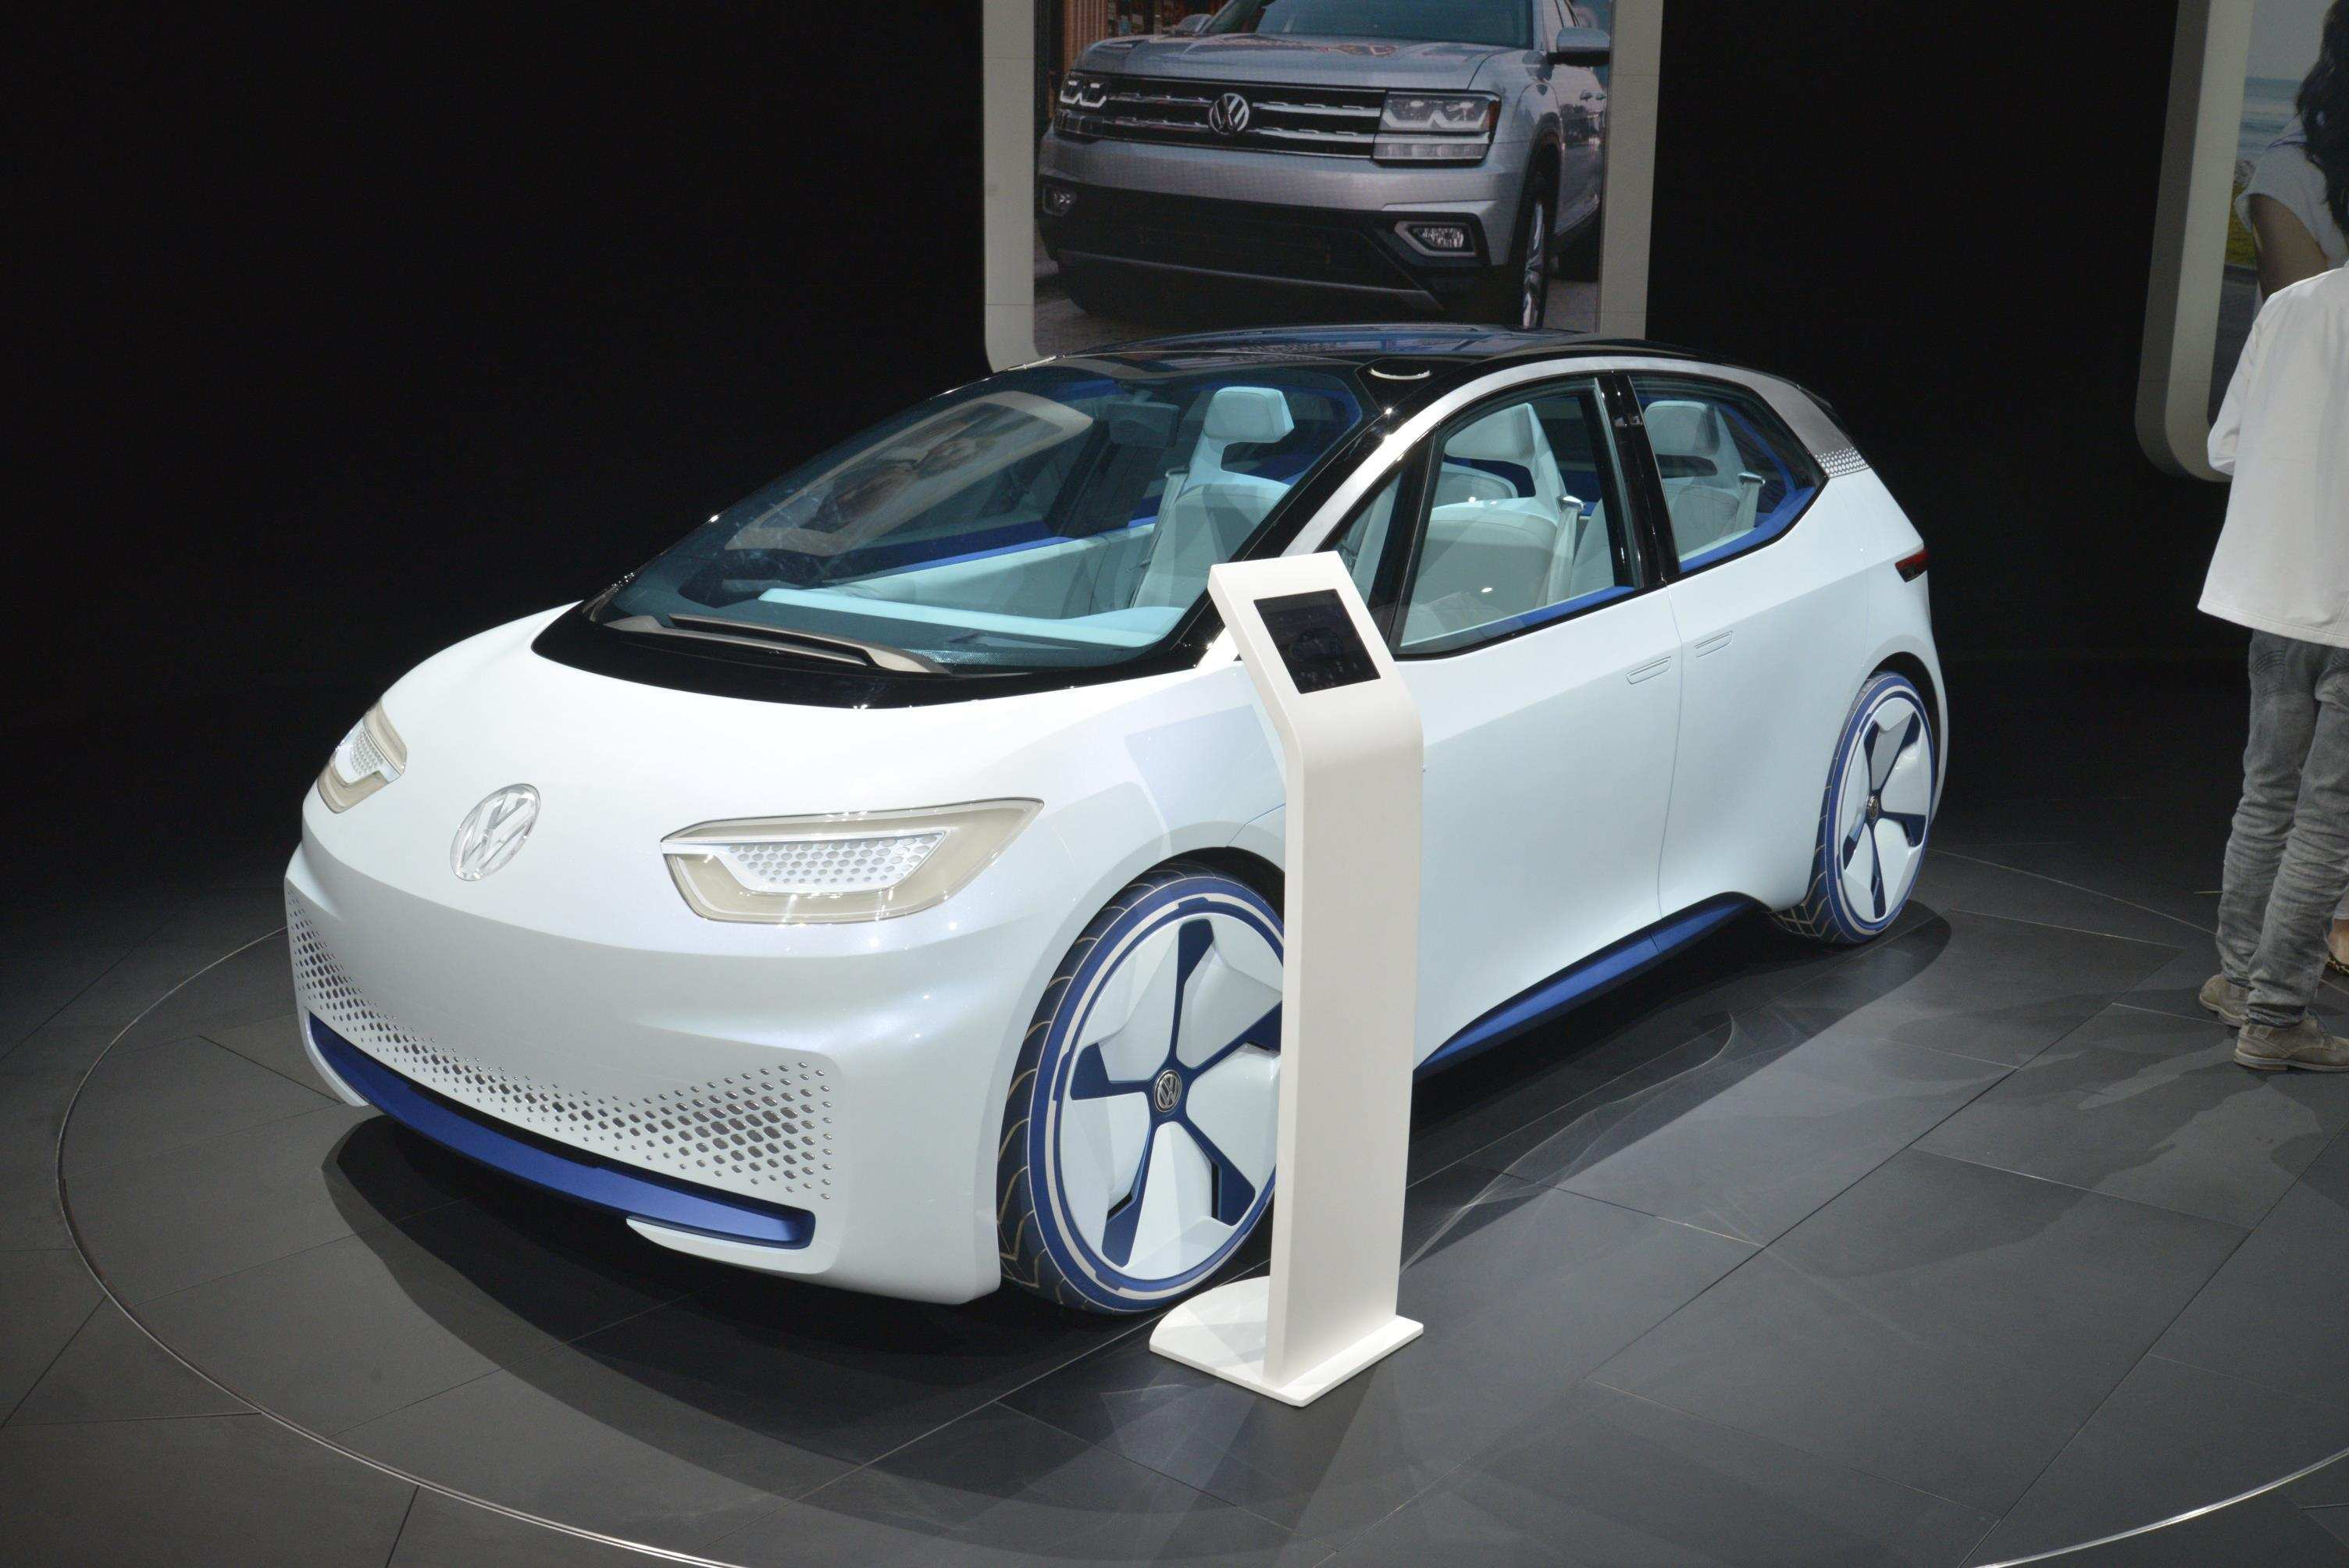 12 Gallery of Volkswagen Id 2019 Prices with Volkswagen Id 2019